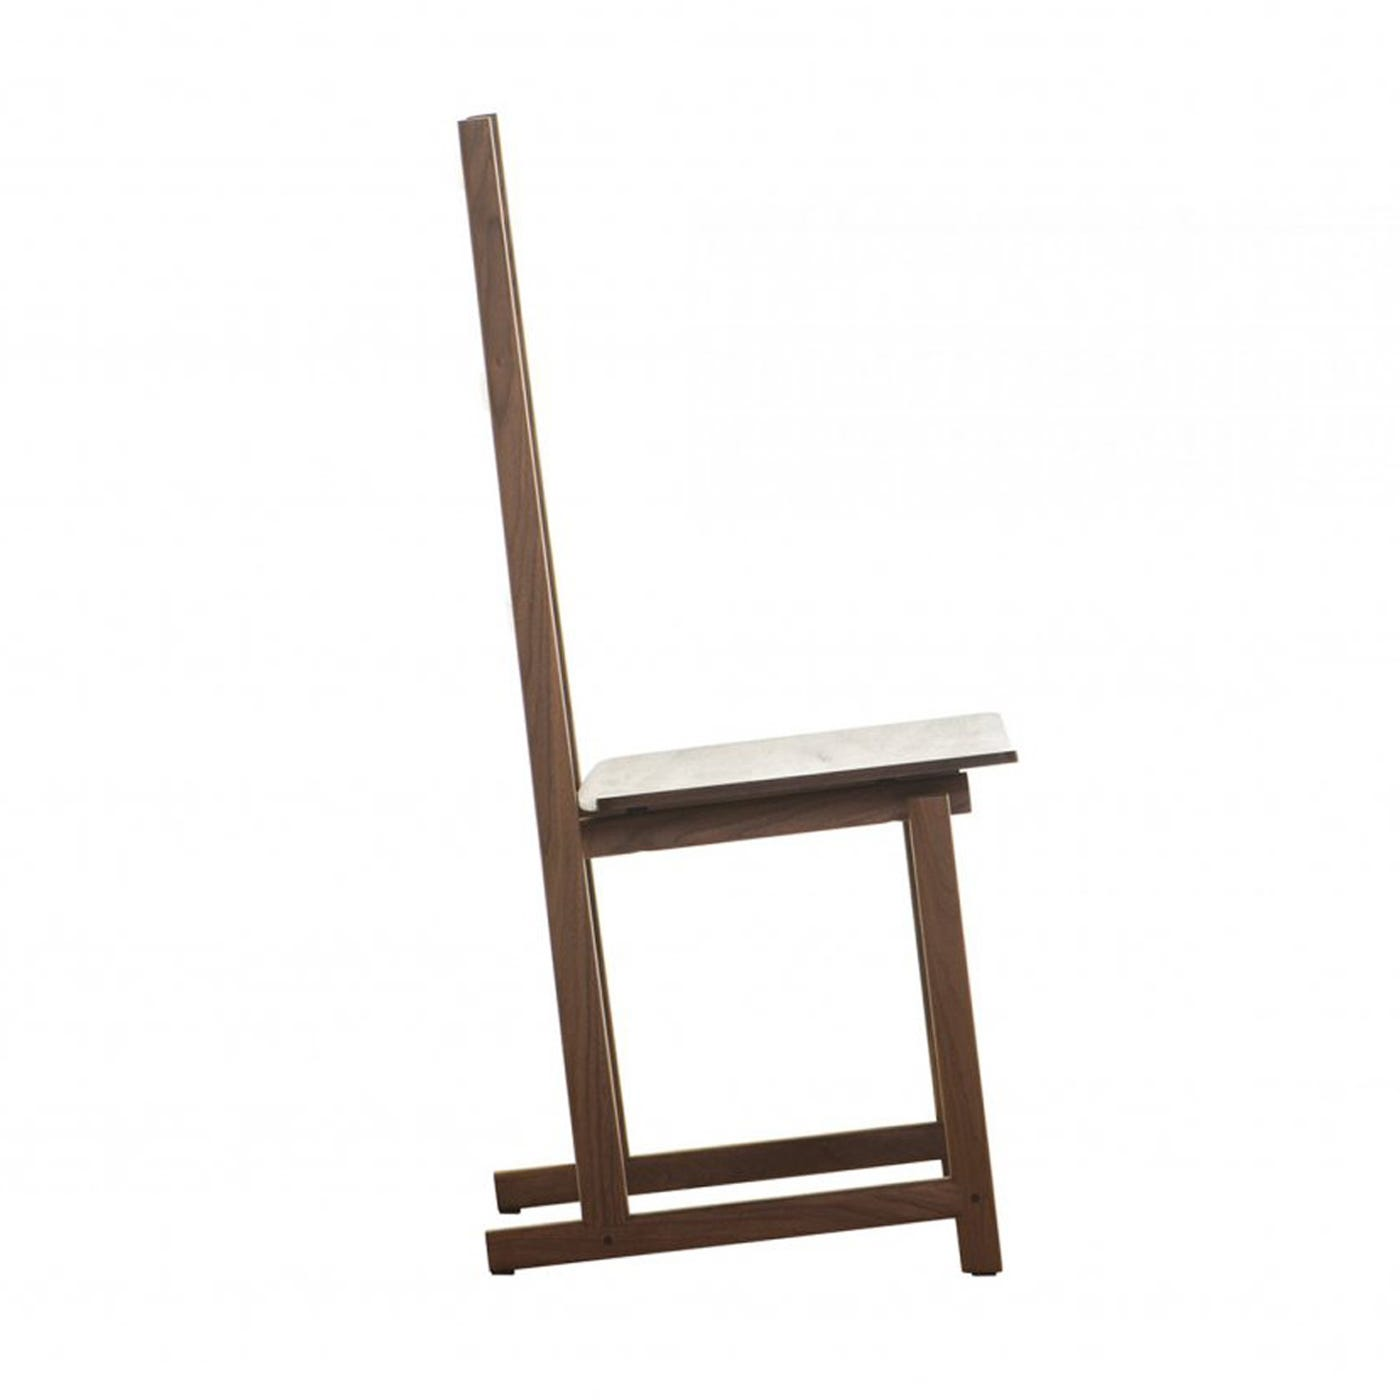 Neri & Hu Shaker Dining Chair in Walnut